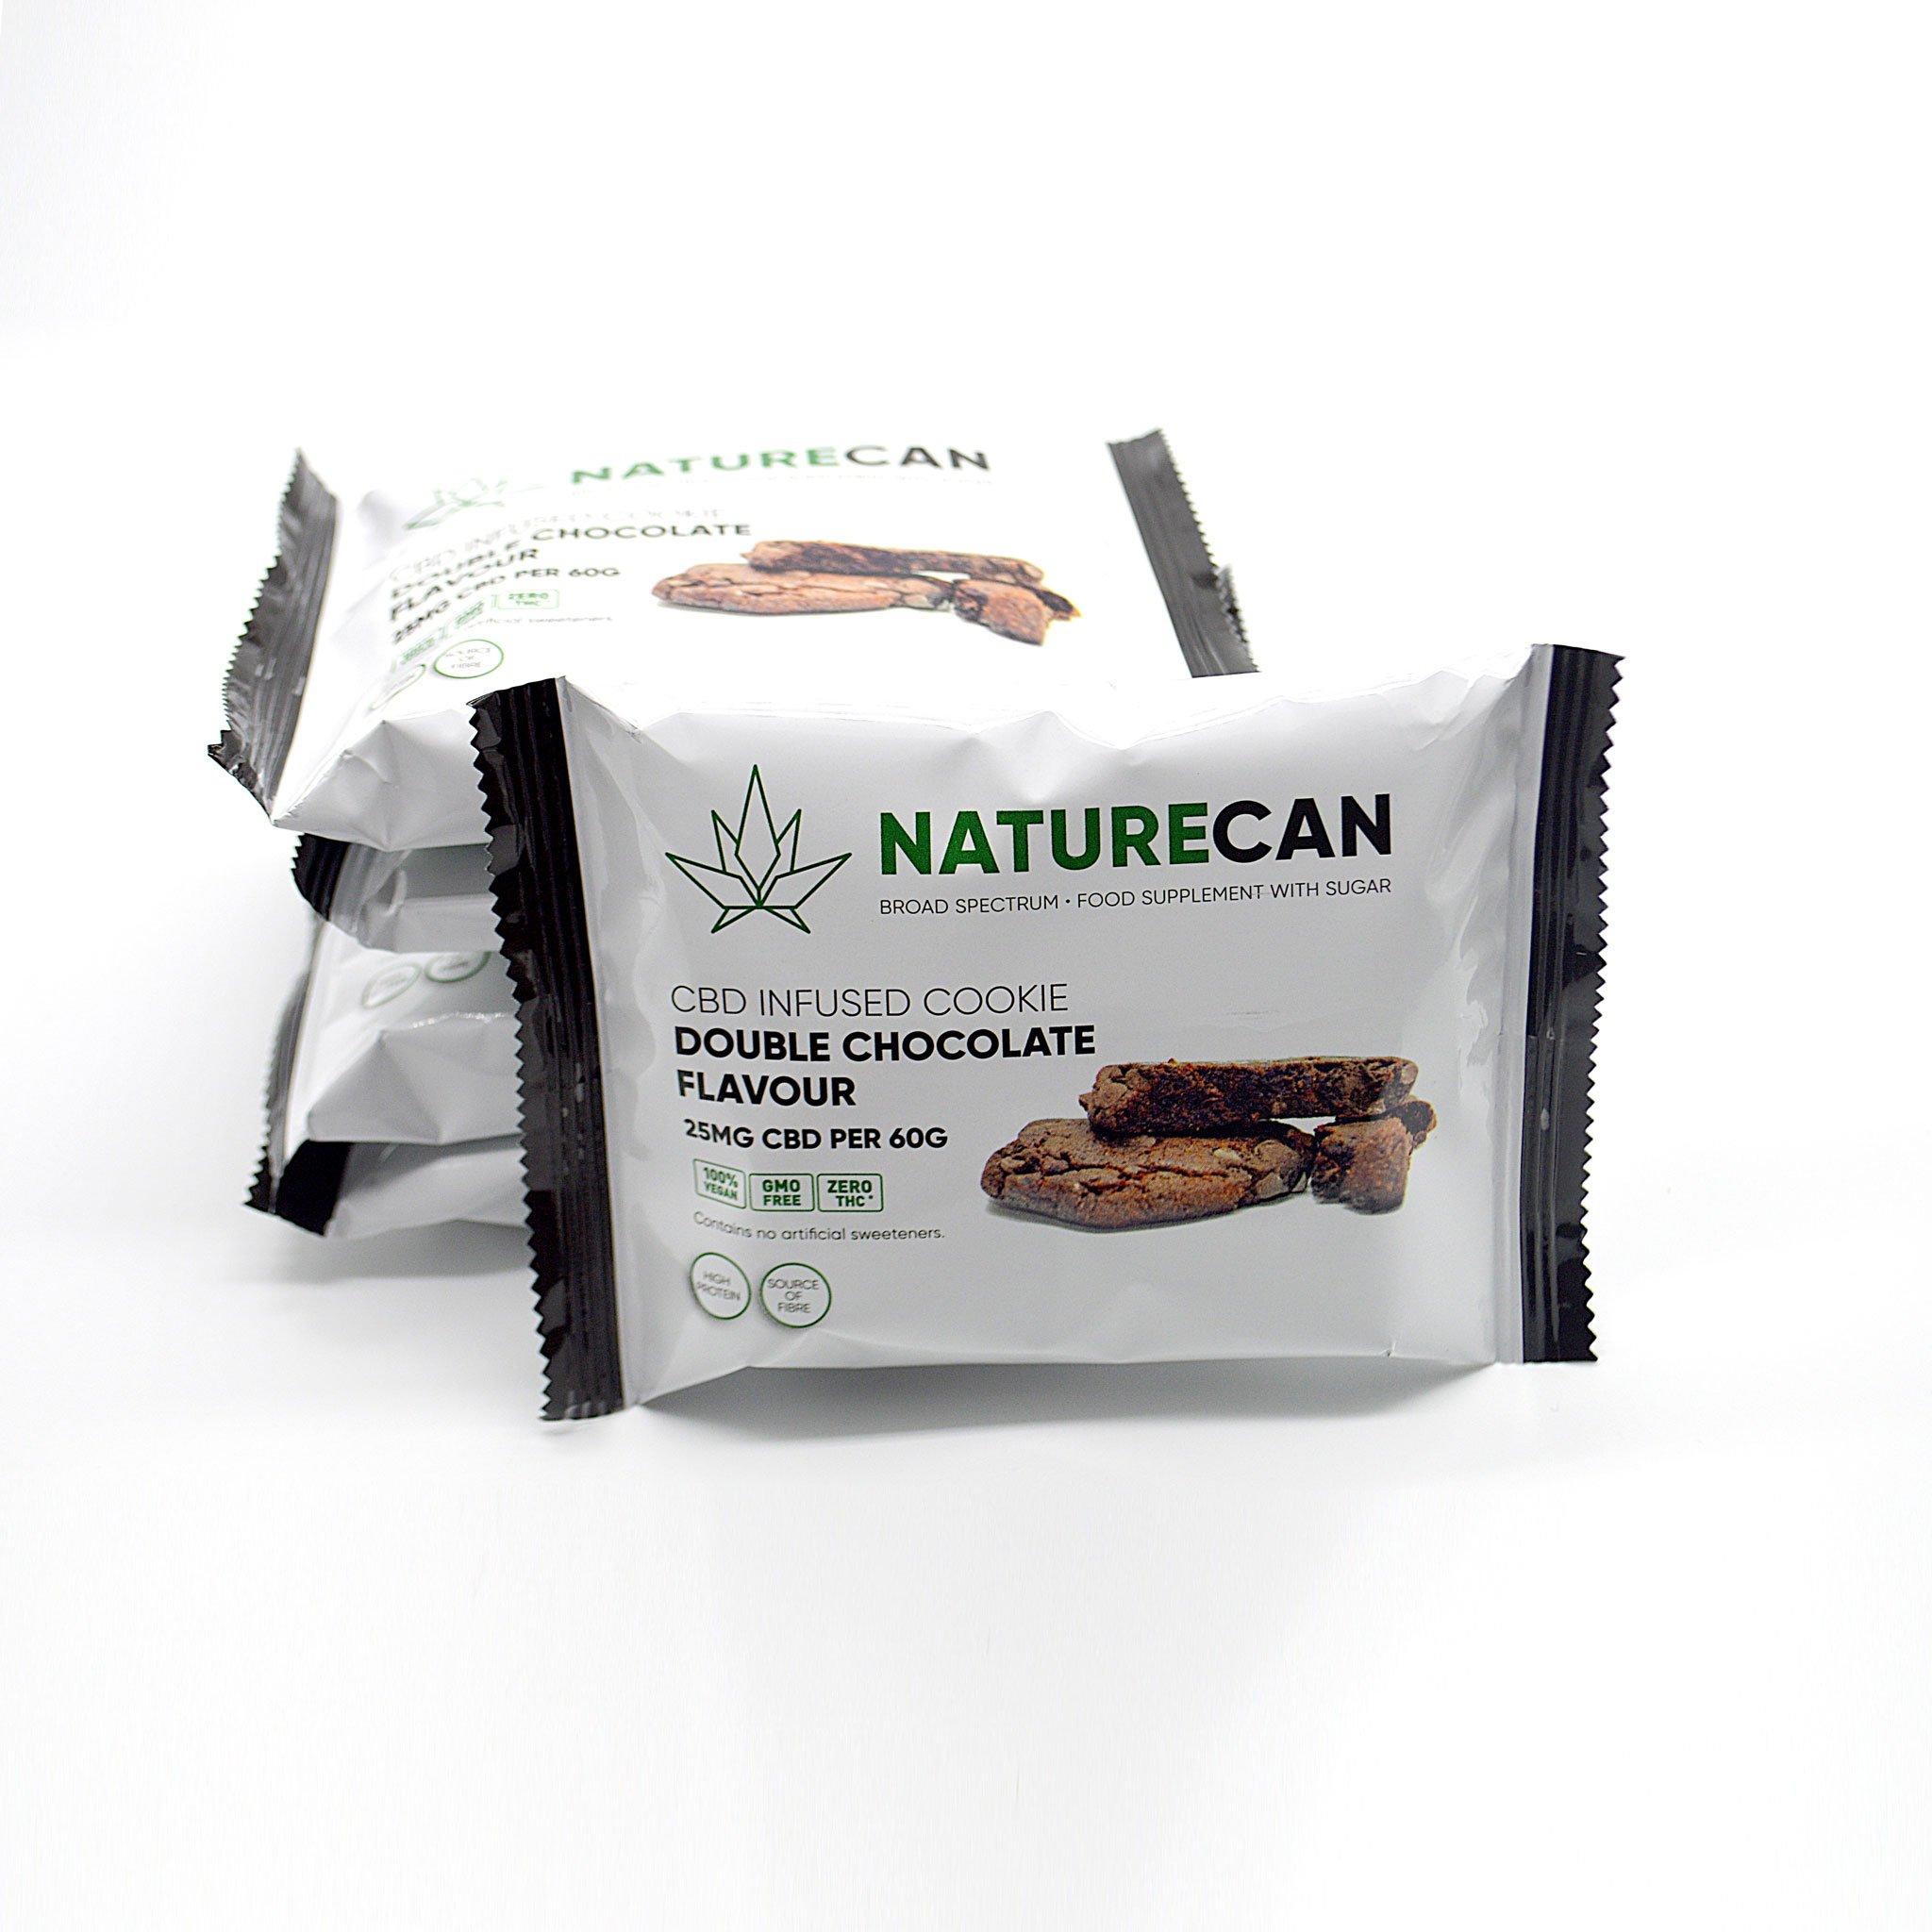 Naturecan 25mg CBD Double Chocolate Vegan Cookie 60g